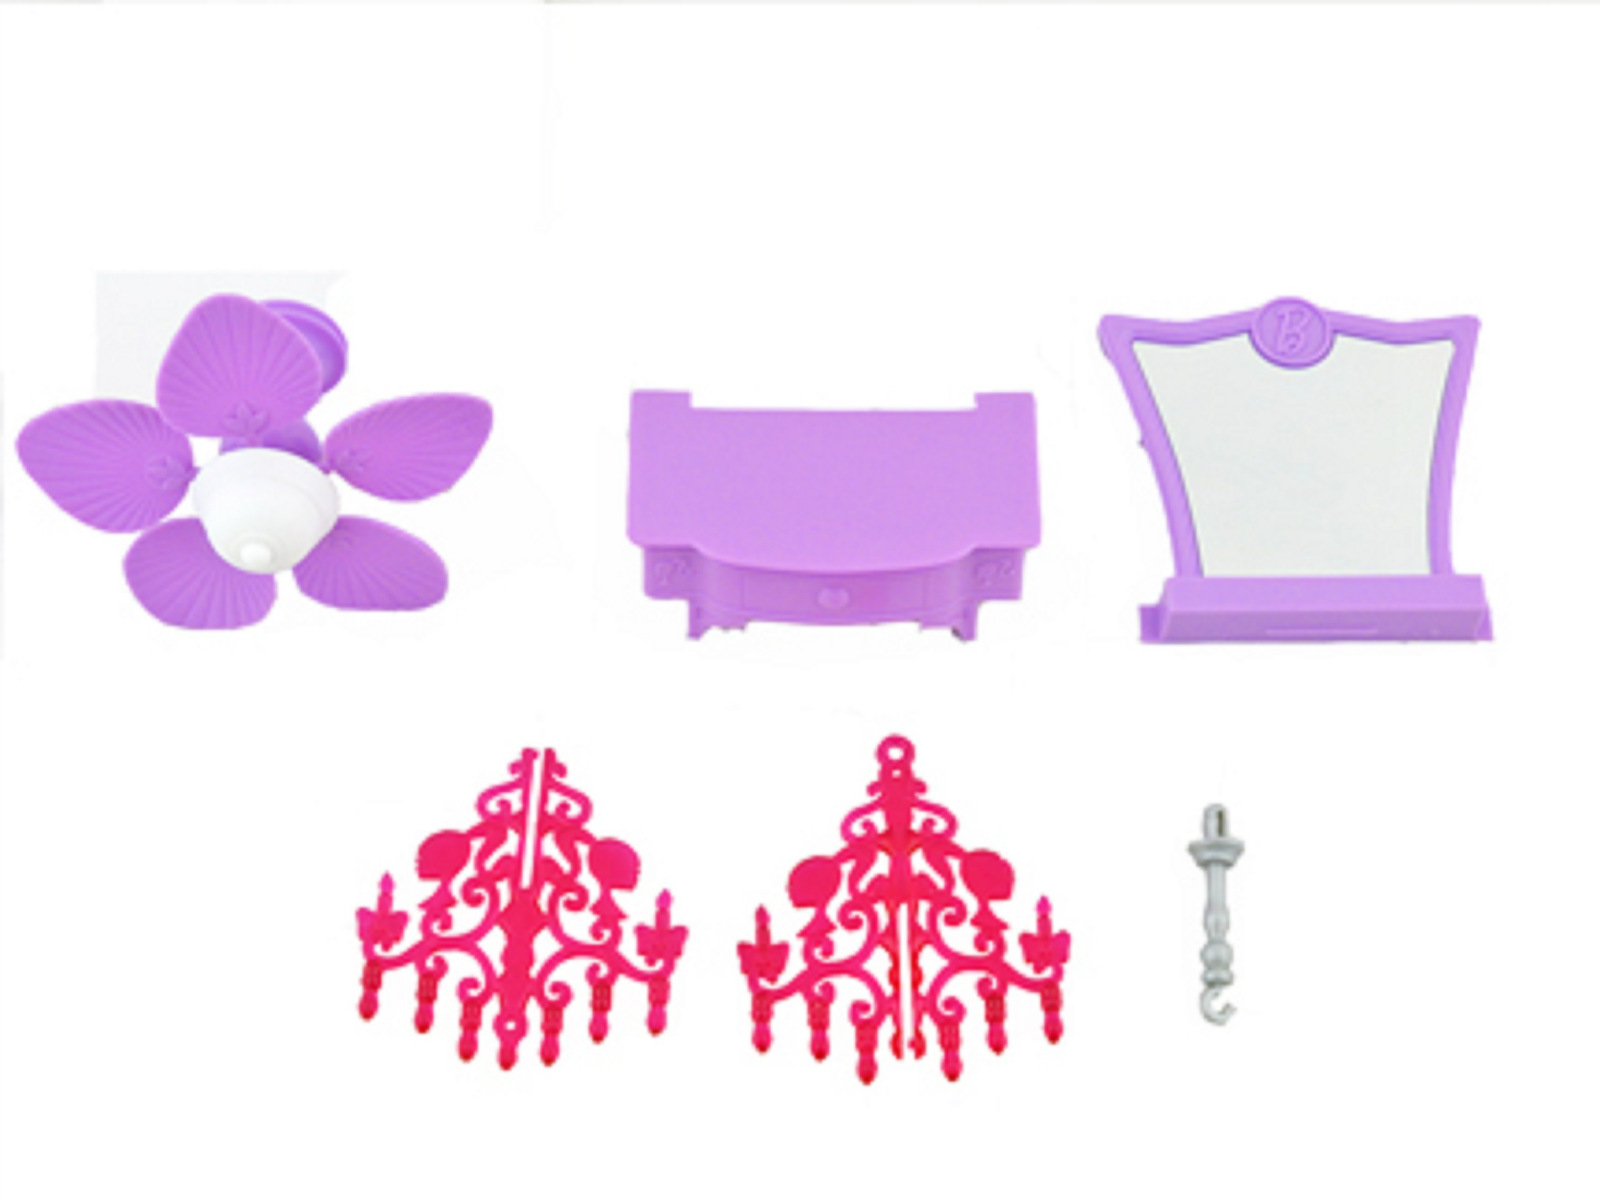 Barbie Malibu Dreamhouse Dream House Replacement Parts Vanity Chandelier Fan